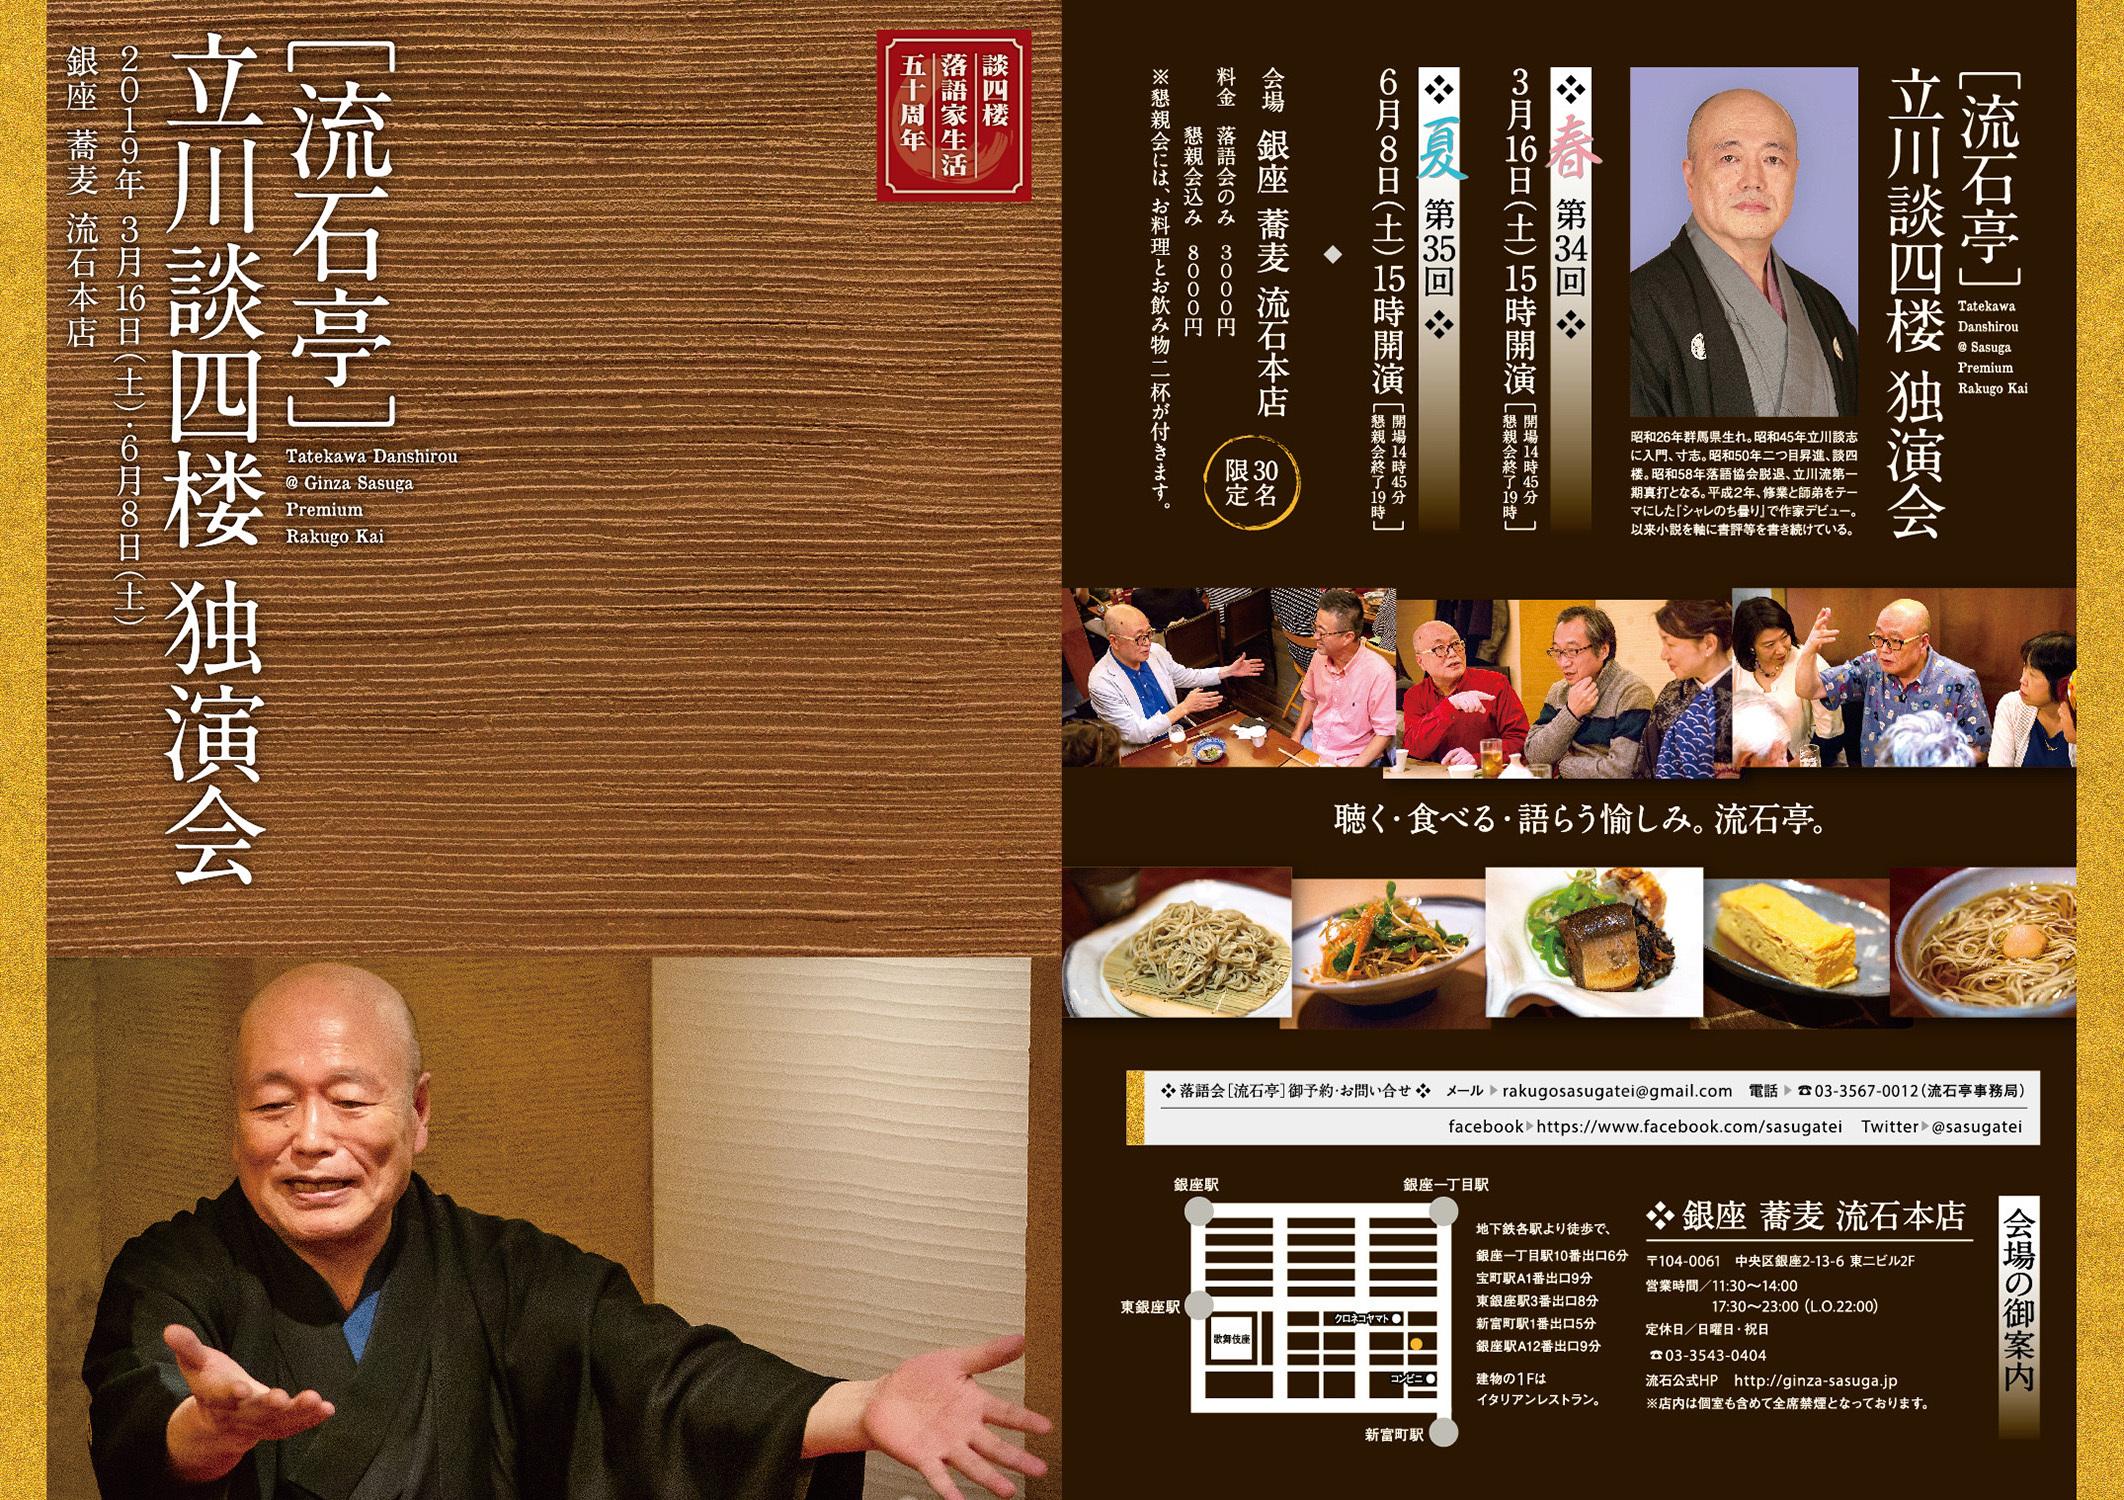 sasuga2019a.jpg